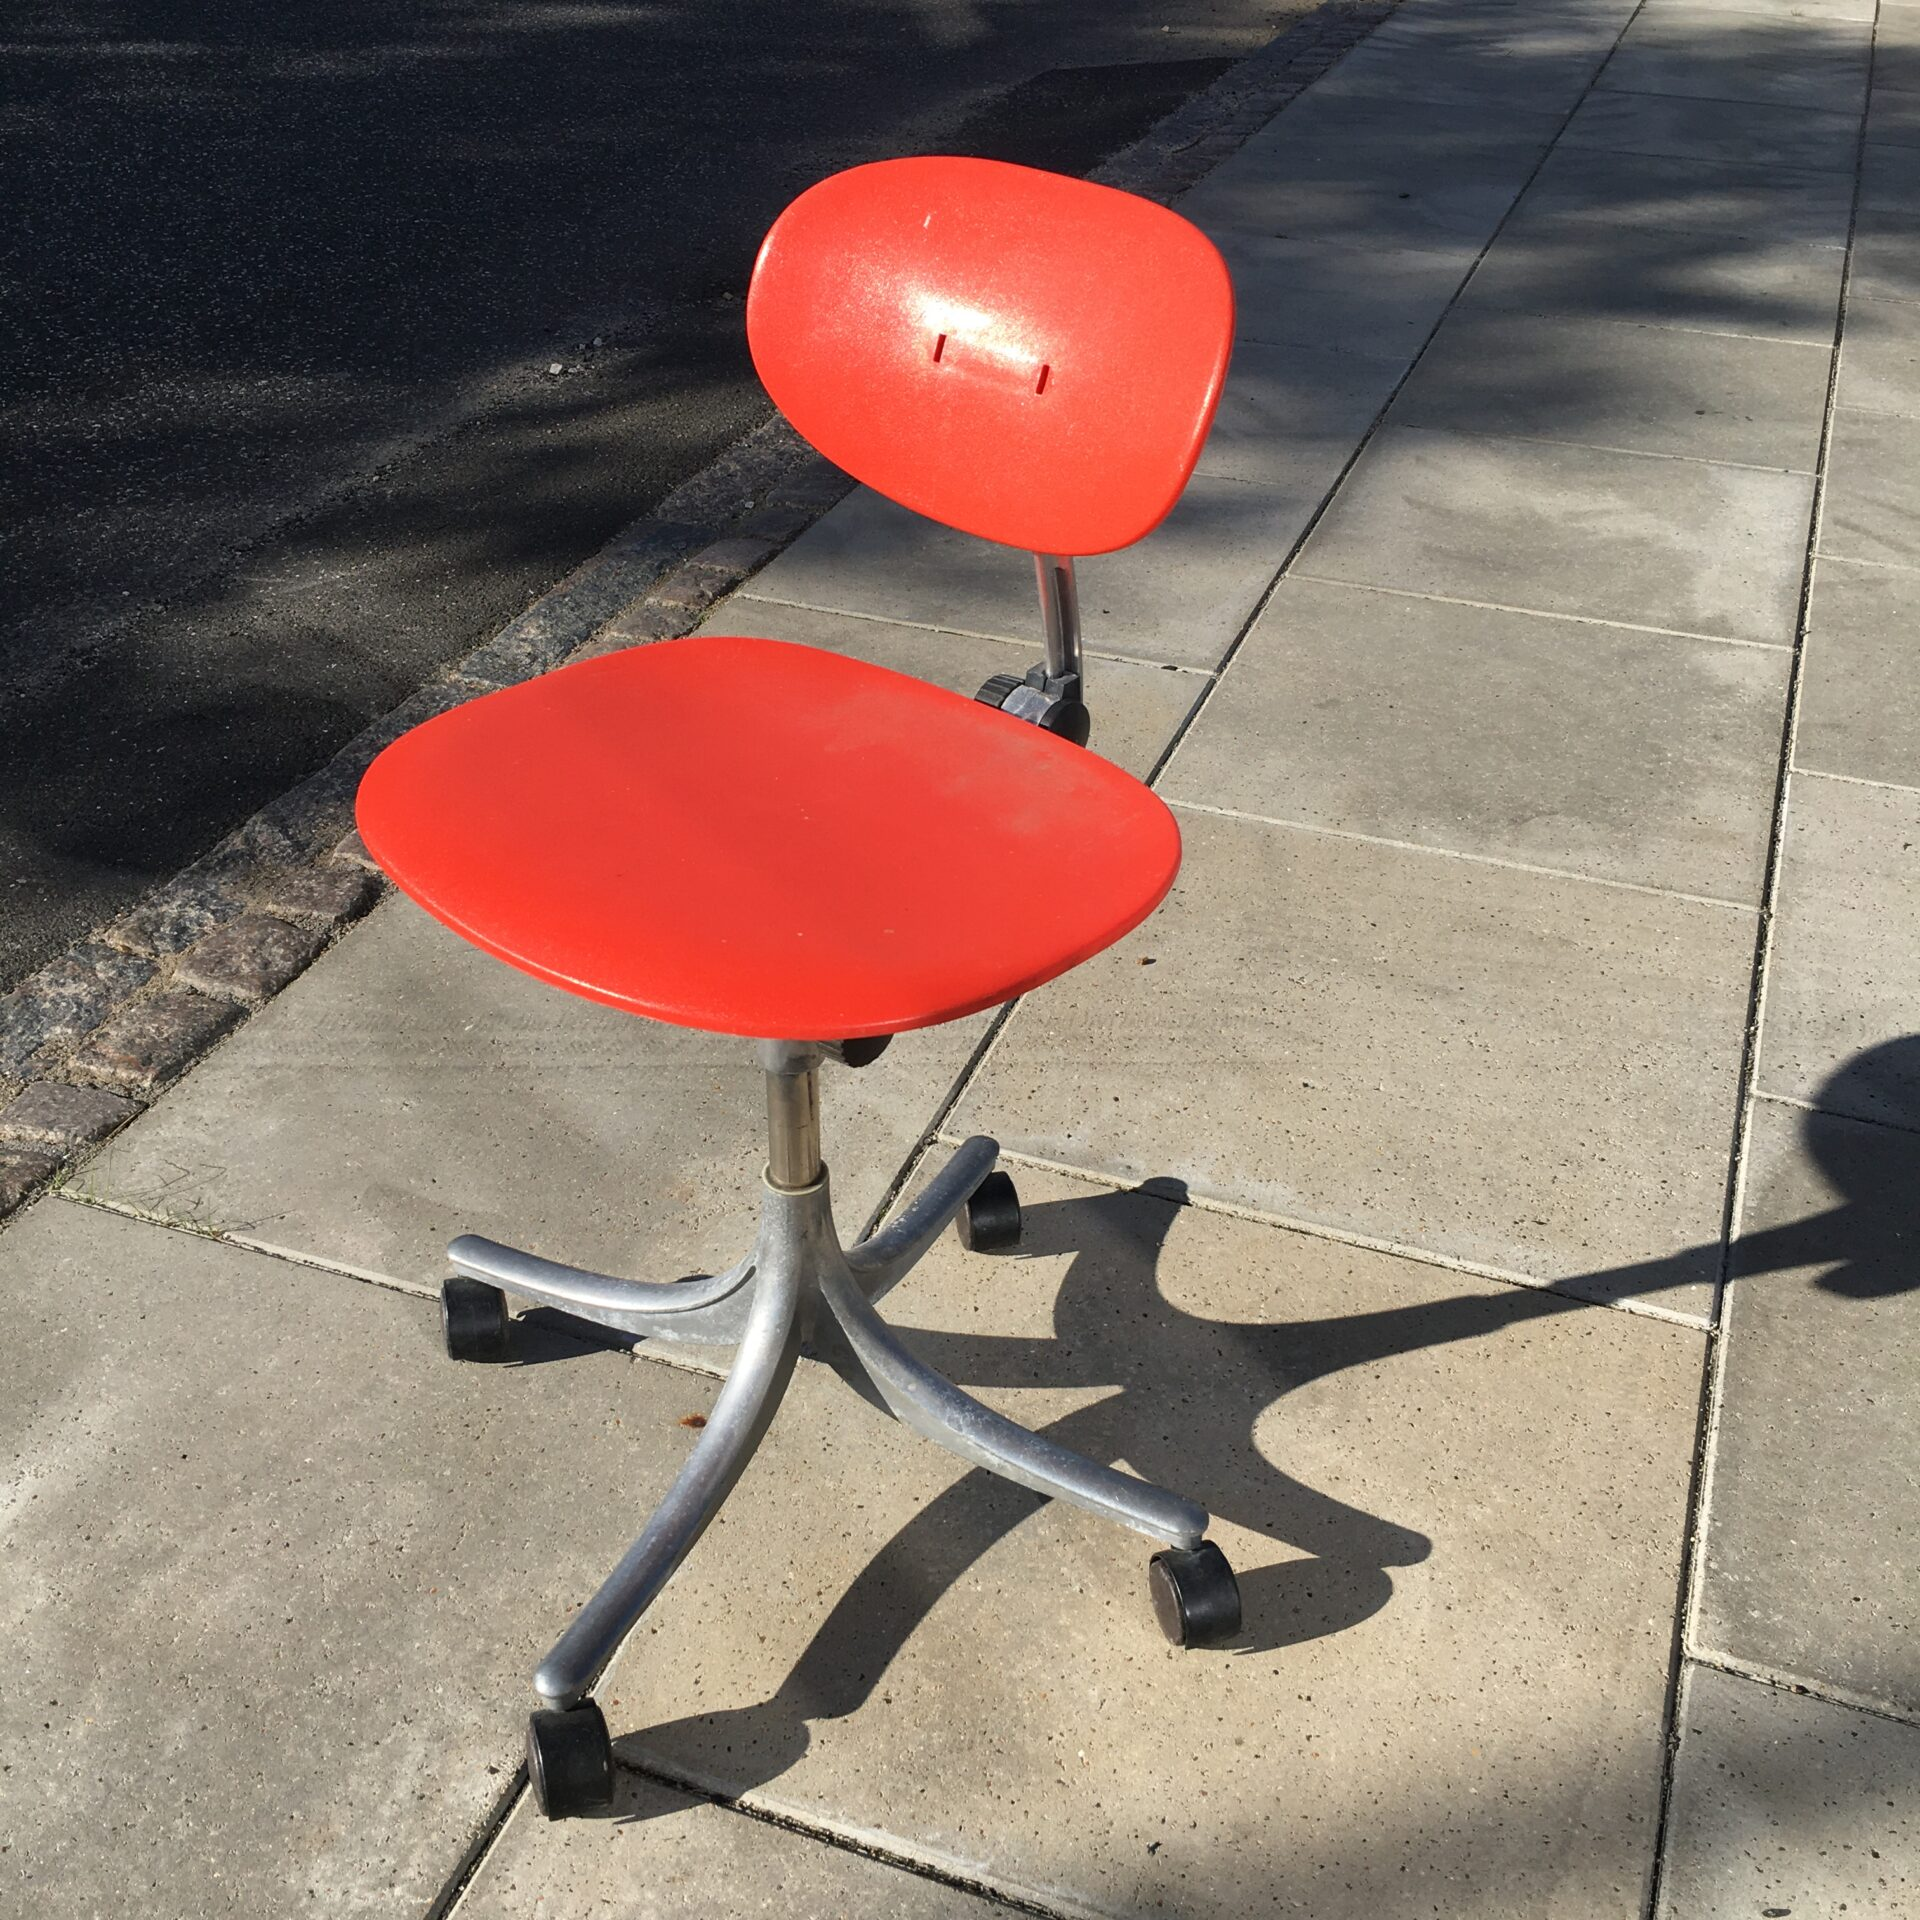 Retro kontorstol, stemplet Jørgen Rasmussen design, pris 500kr